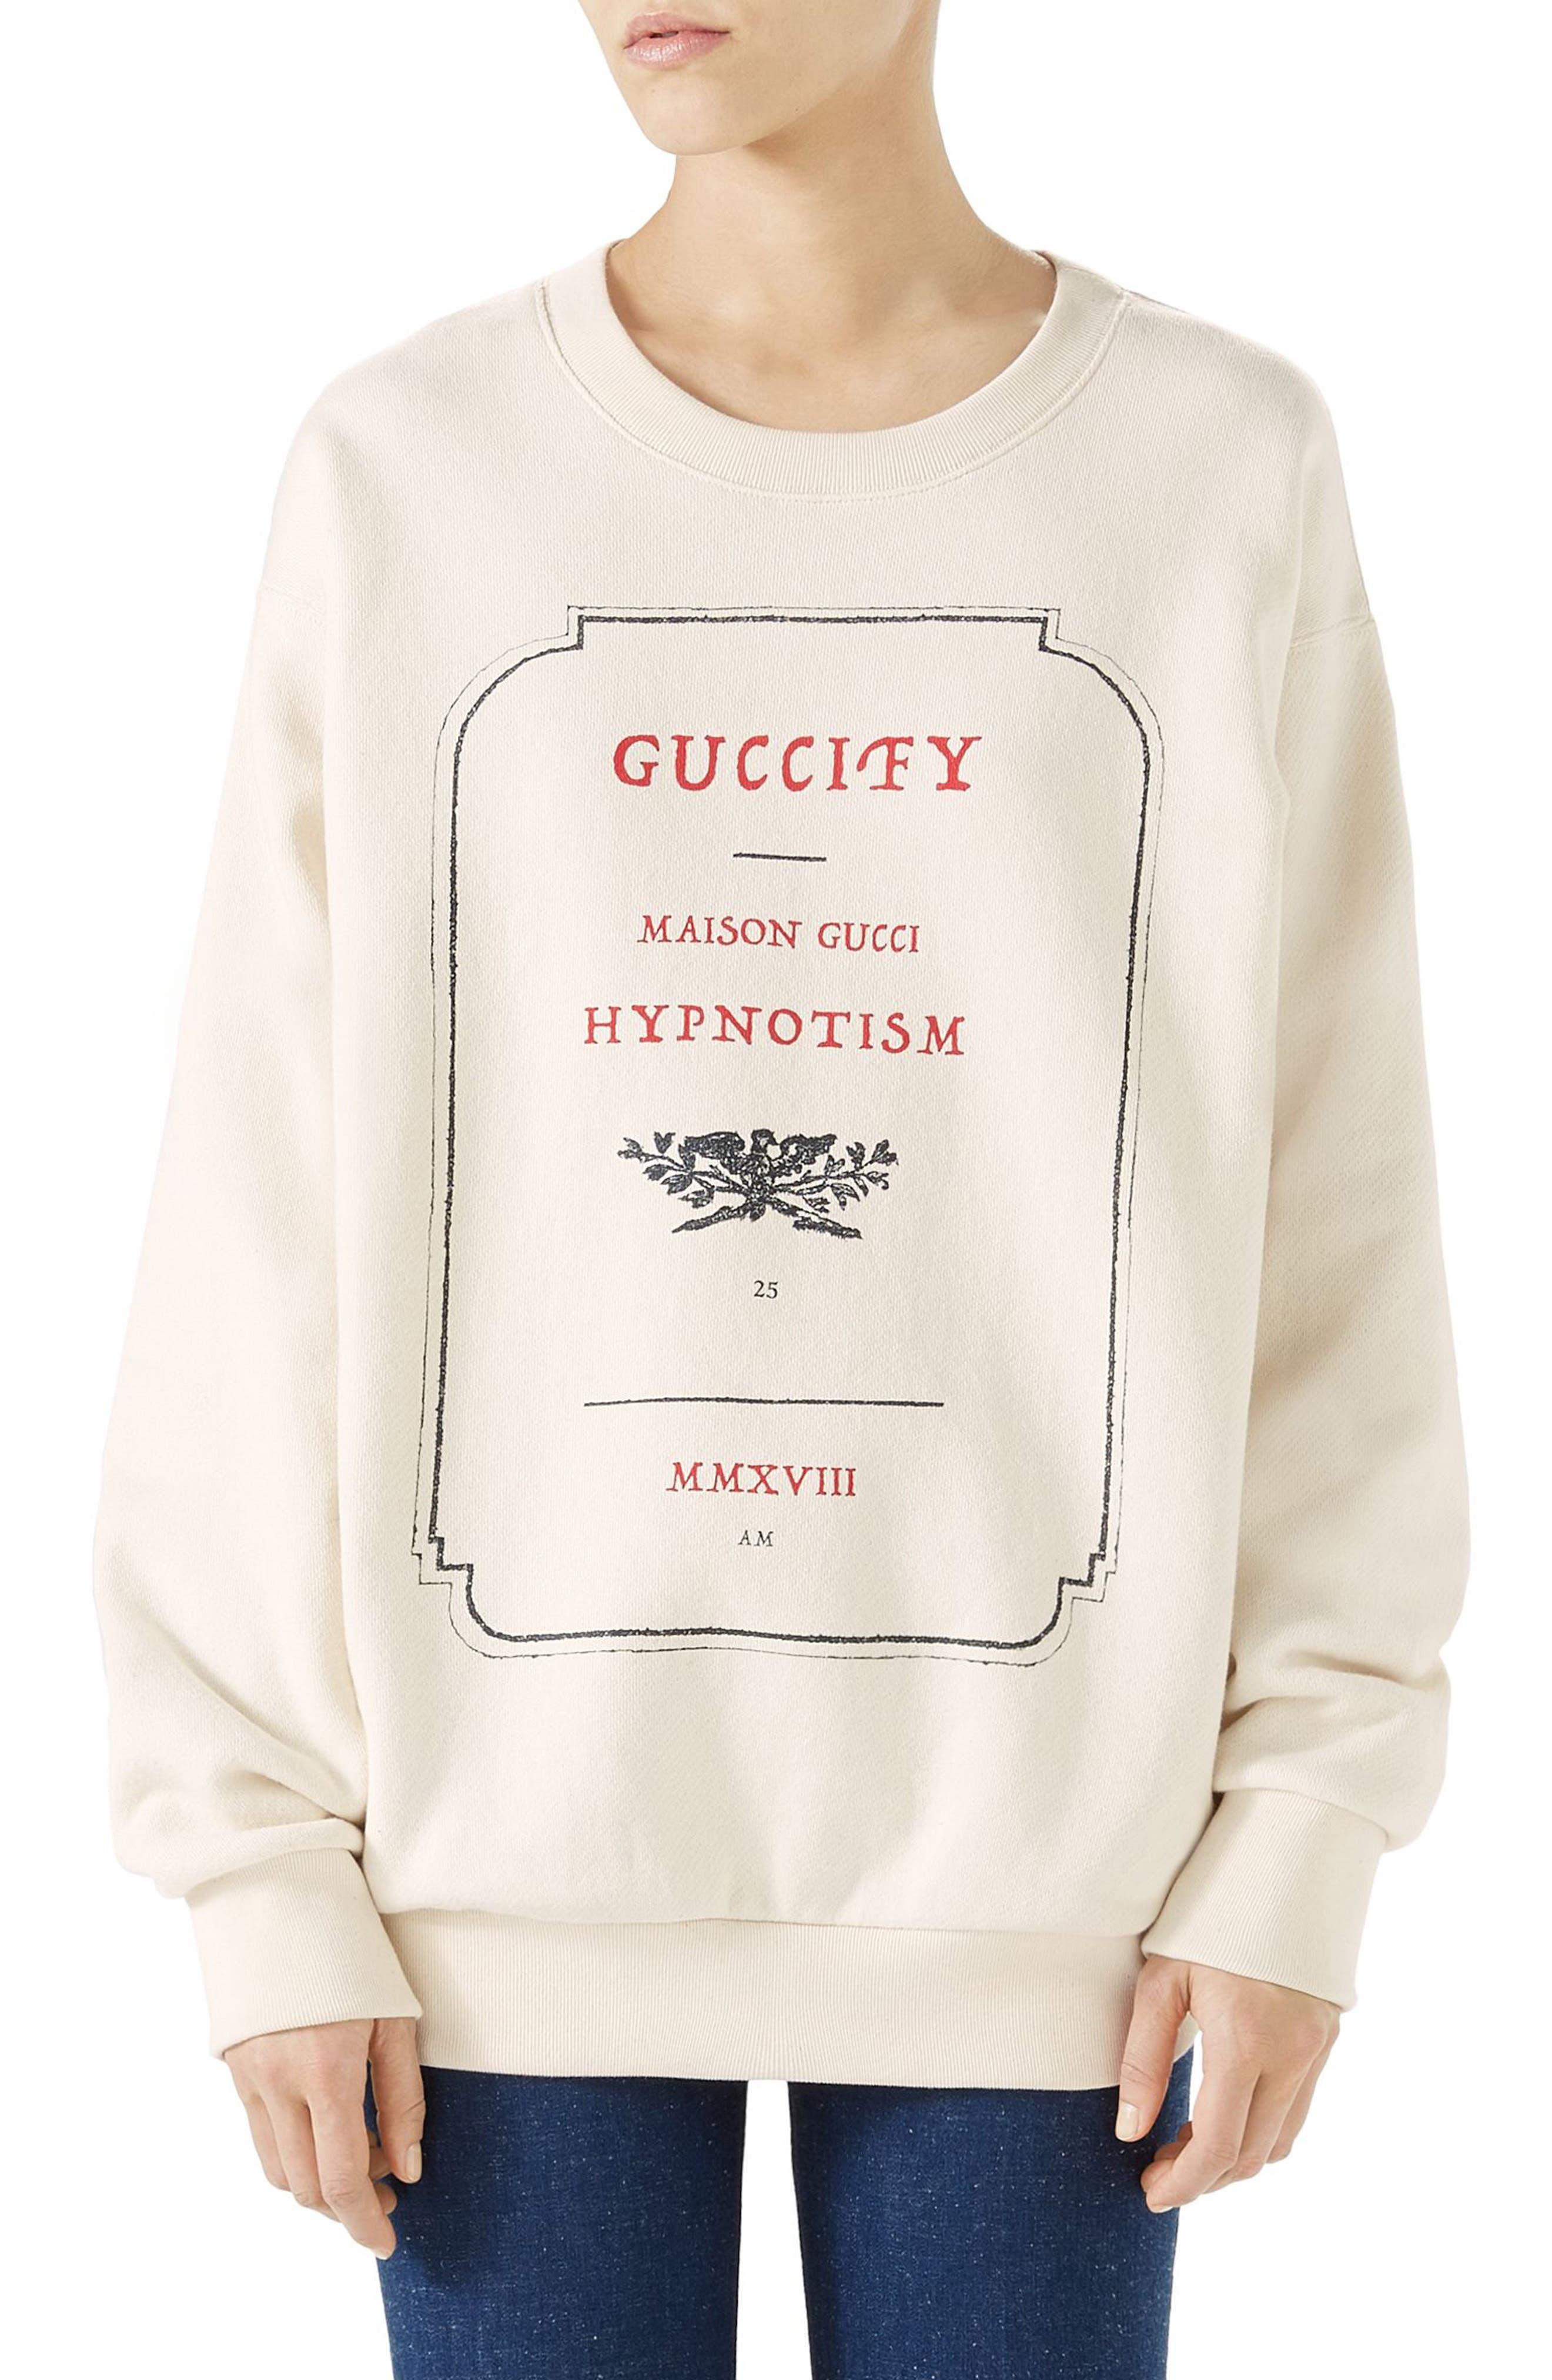 Hypnotism Graphic Sweatshirt,                         Main,                         color, Natural White/ Multicolor